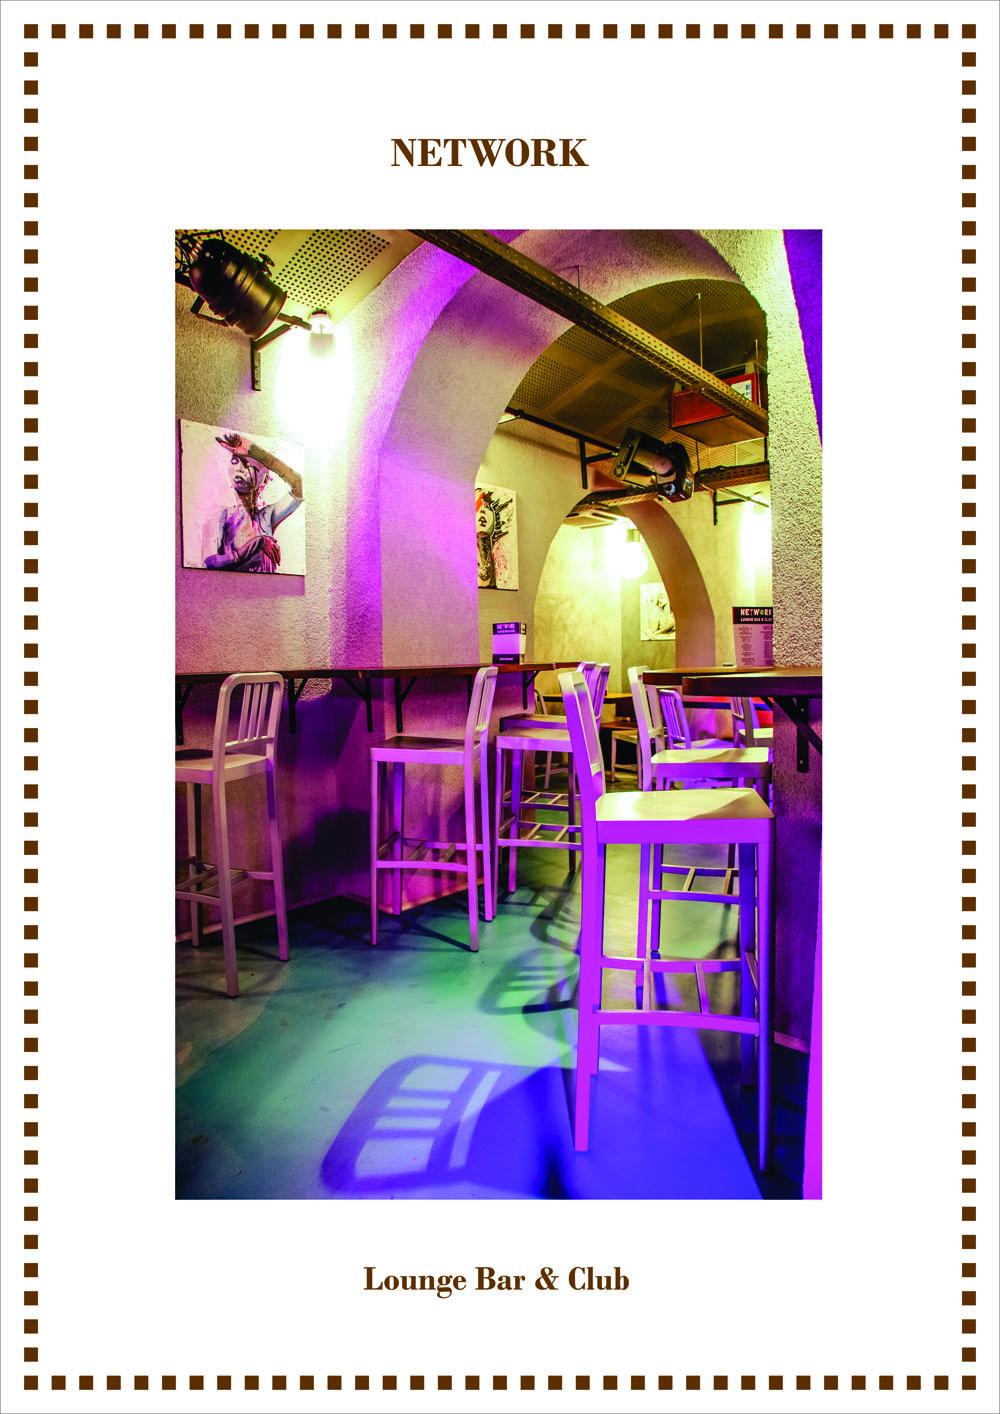 Network Lounge Bar&Club, Bucuresti  - Poza 2